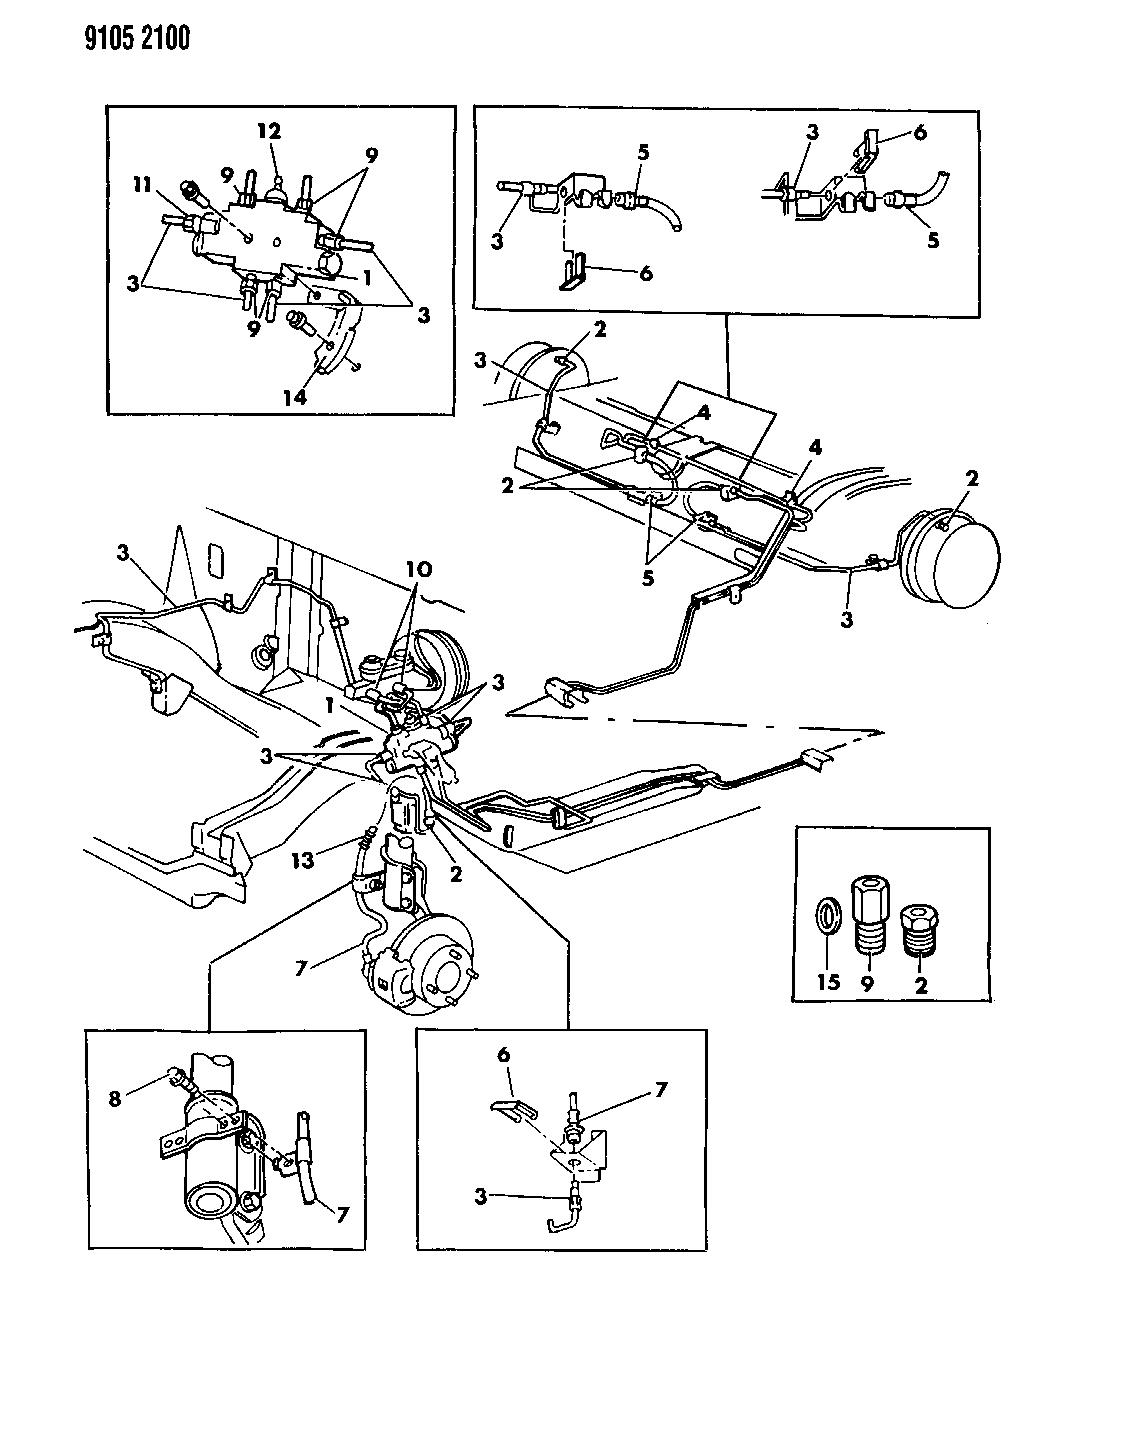 89 dodge omni wiring 390b 1988 dodge omni wiring diagrams wiring library  390b 1988 dodge omni wiring diagrams